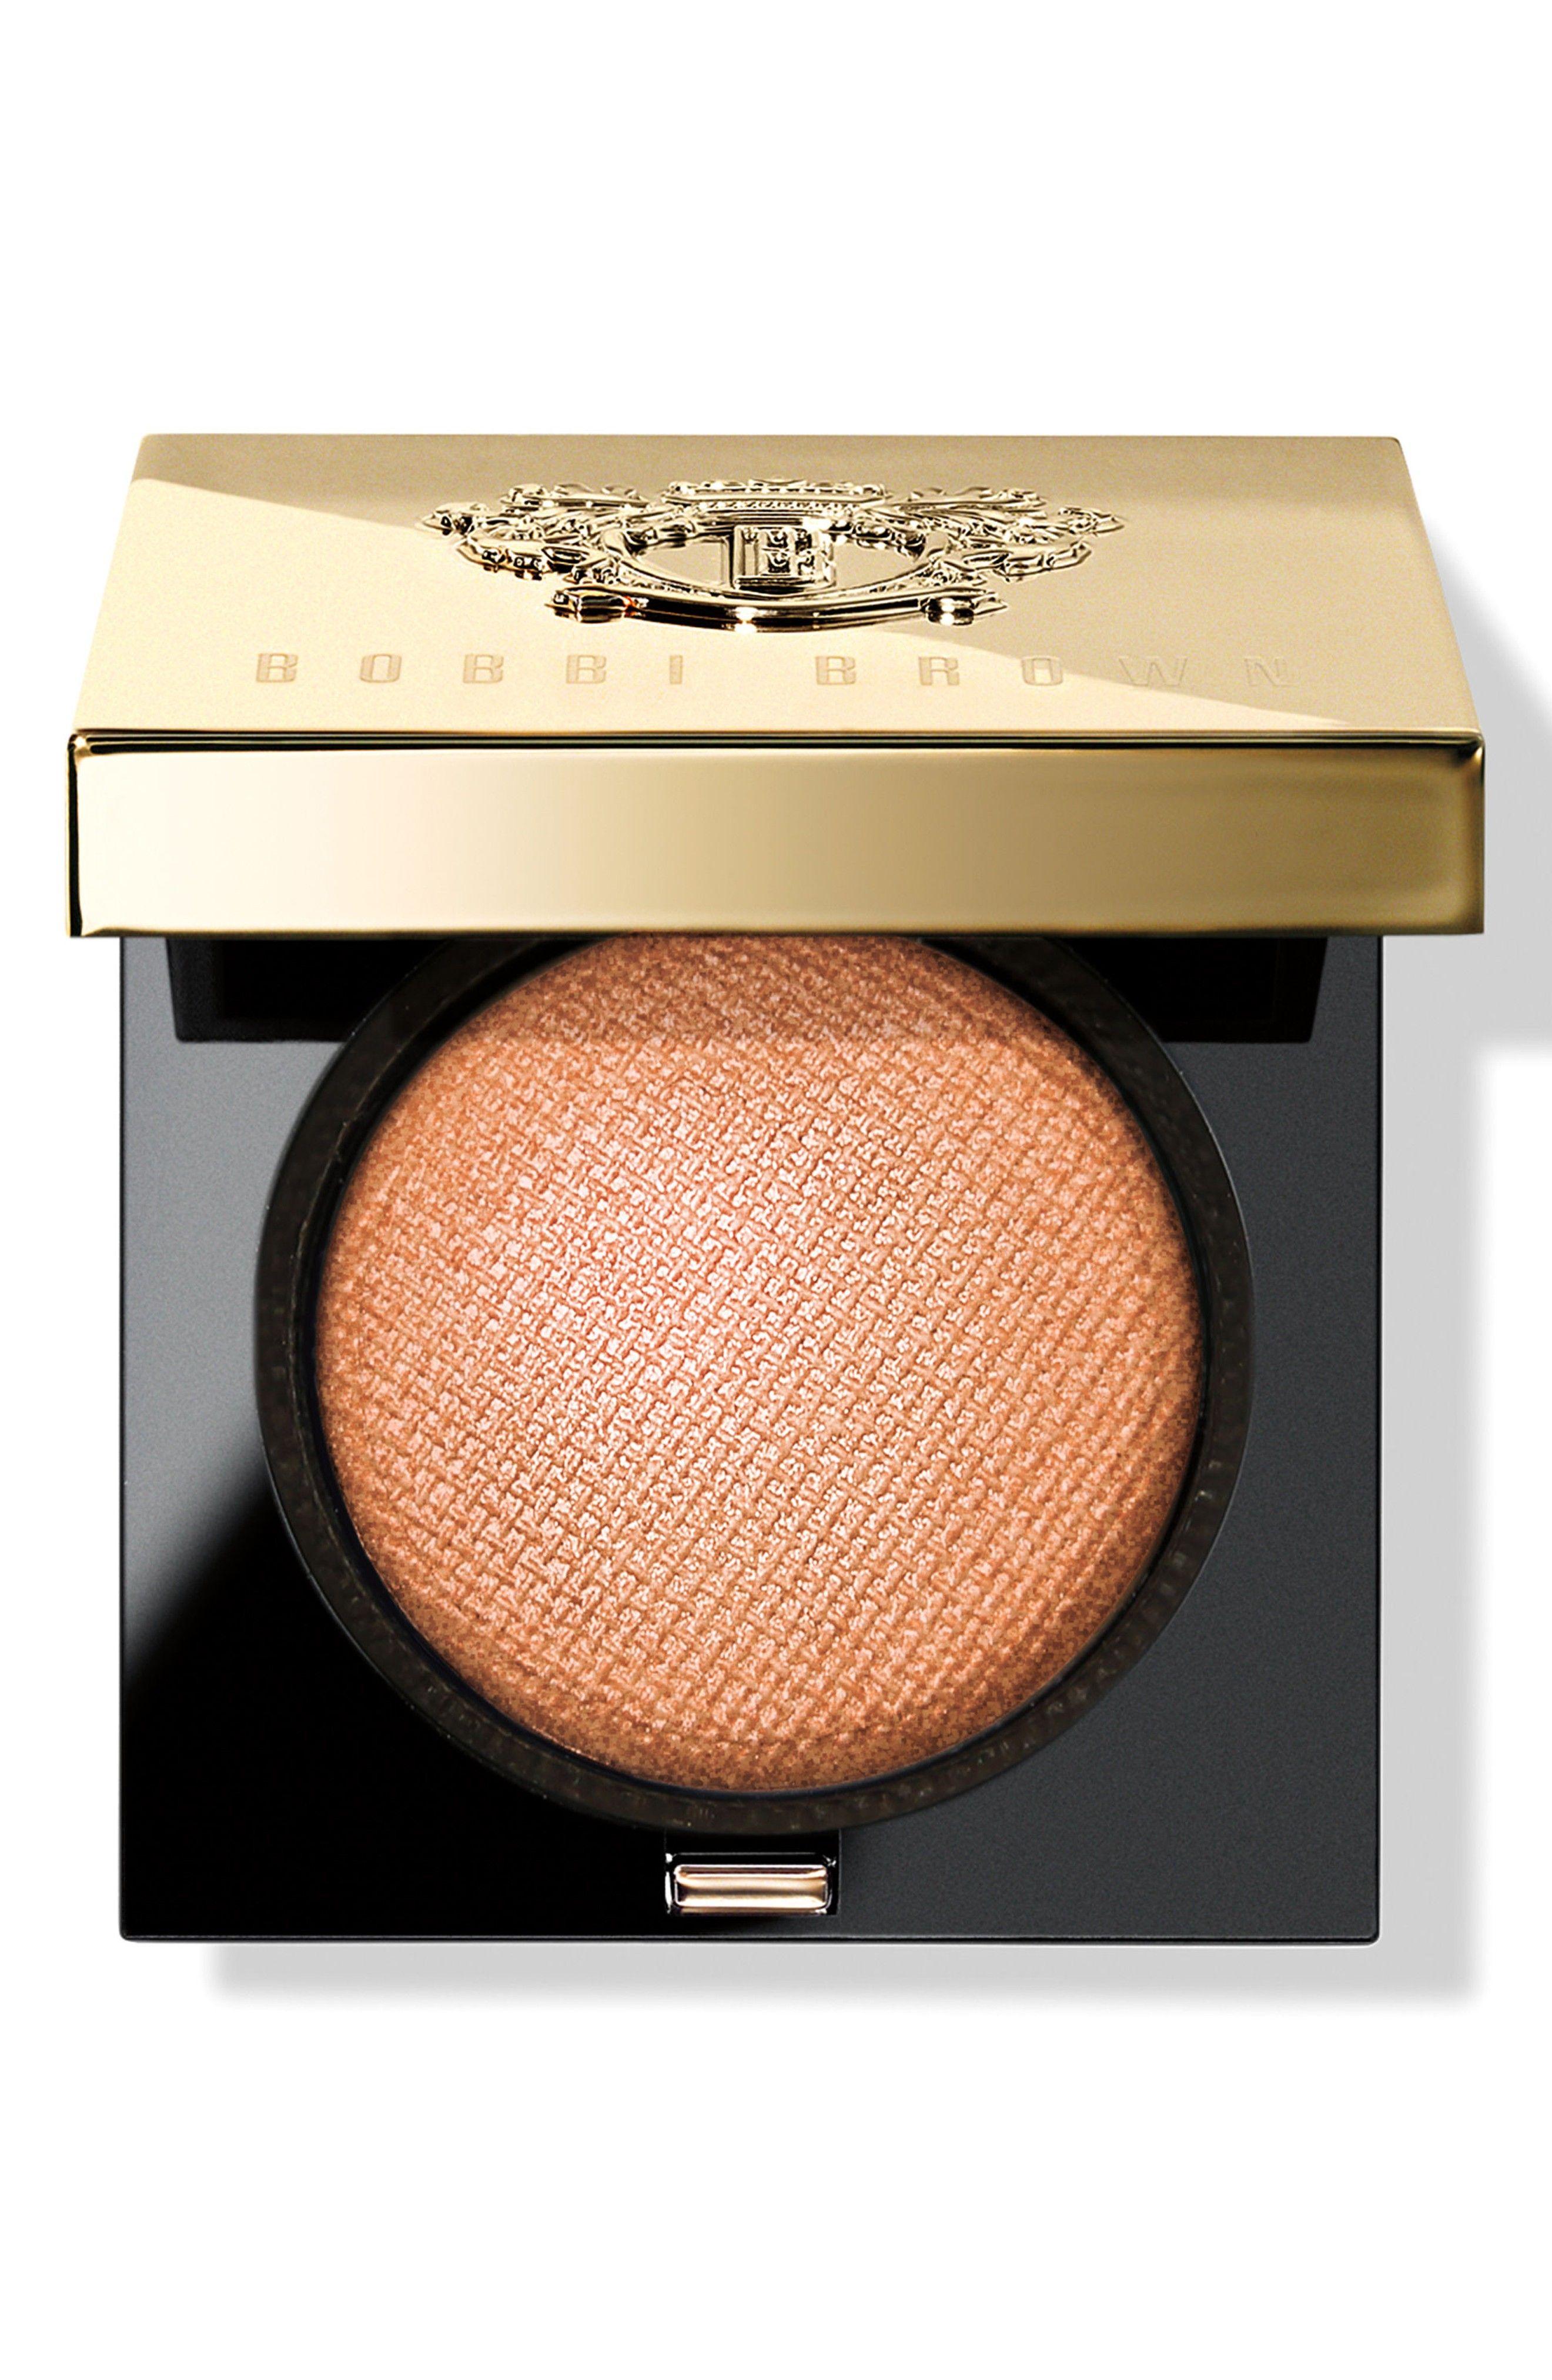 Bobbi brown luxe eyeshadow beauty u more pinterest